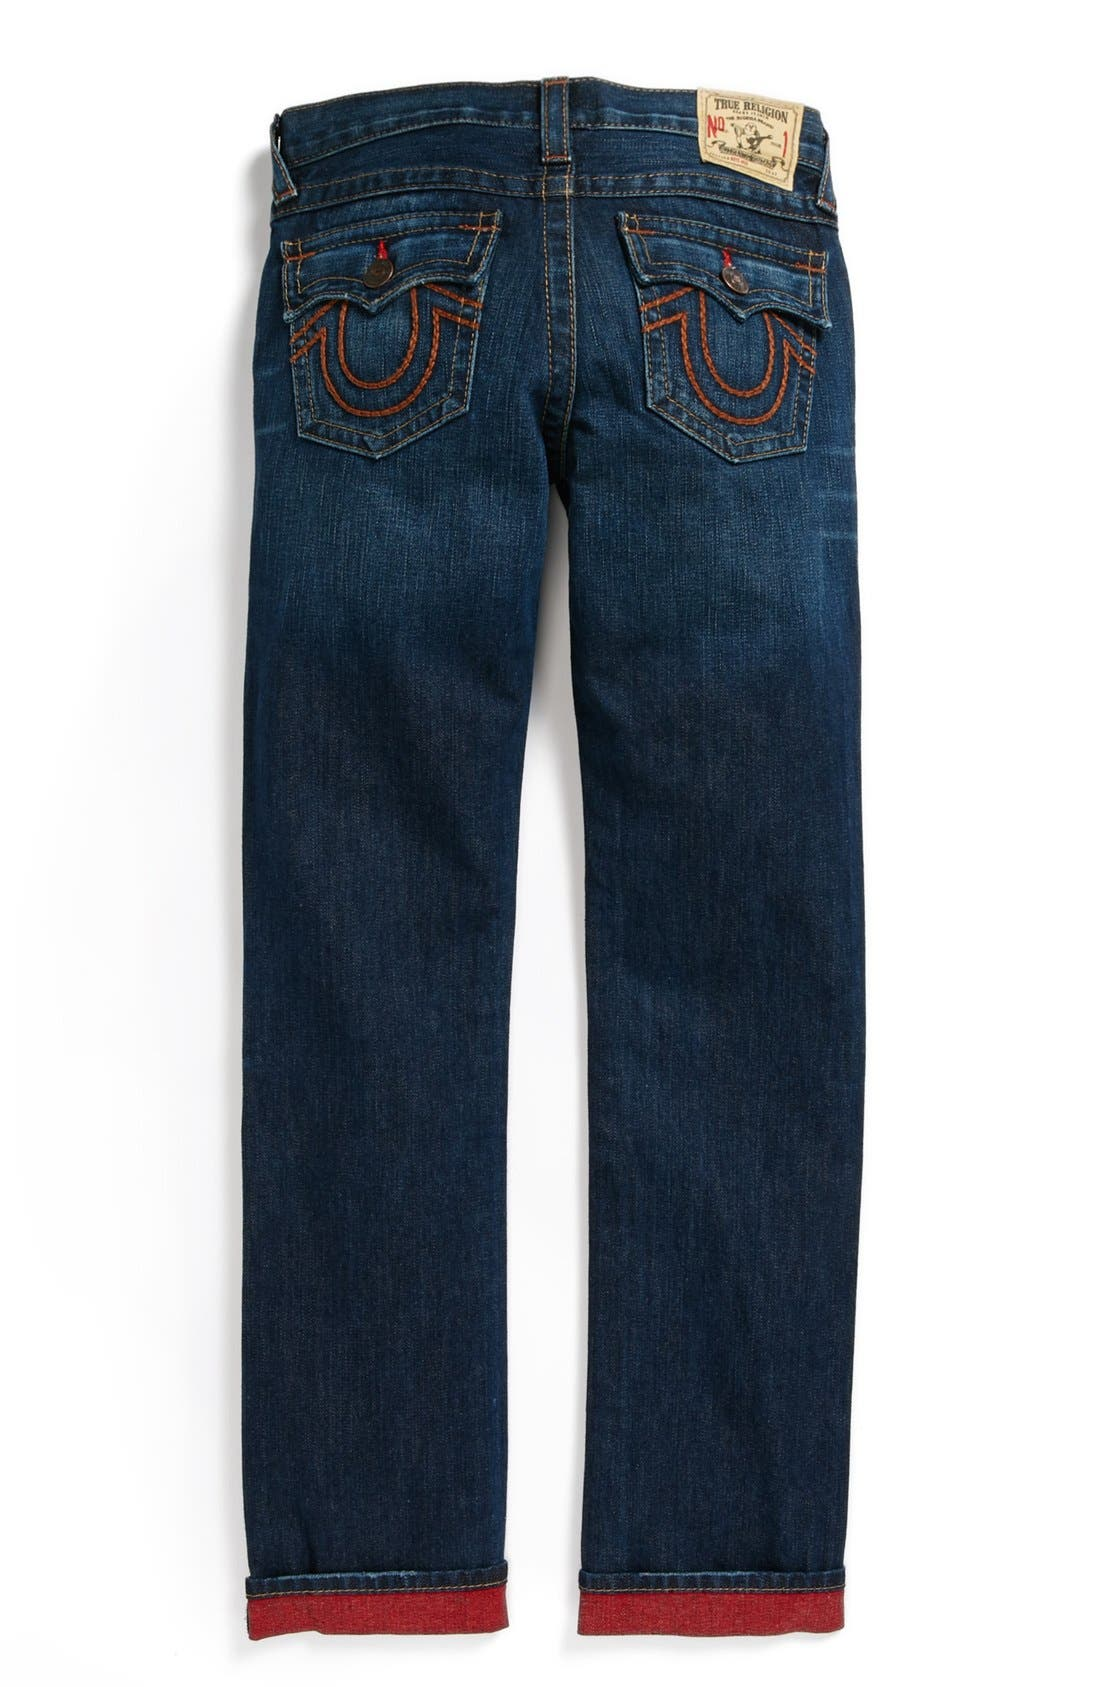 Alternate Image 1 Selected - True Religion Brand Jeans 'Jack' Reverse Dye Slim Leg Jeans (Little Boys & Big Boys)